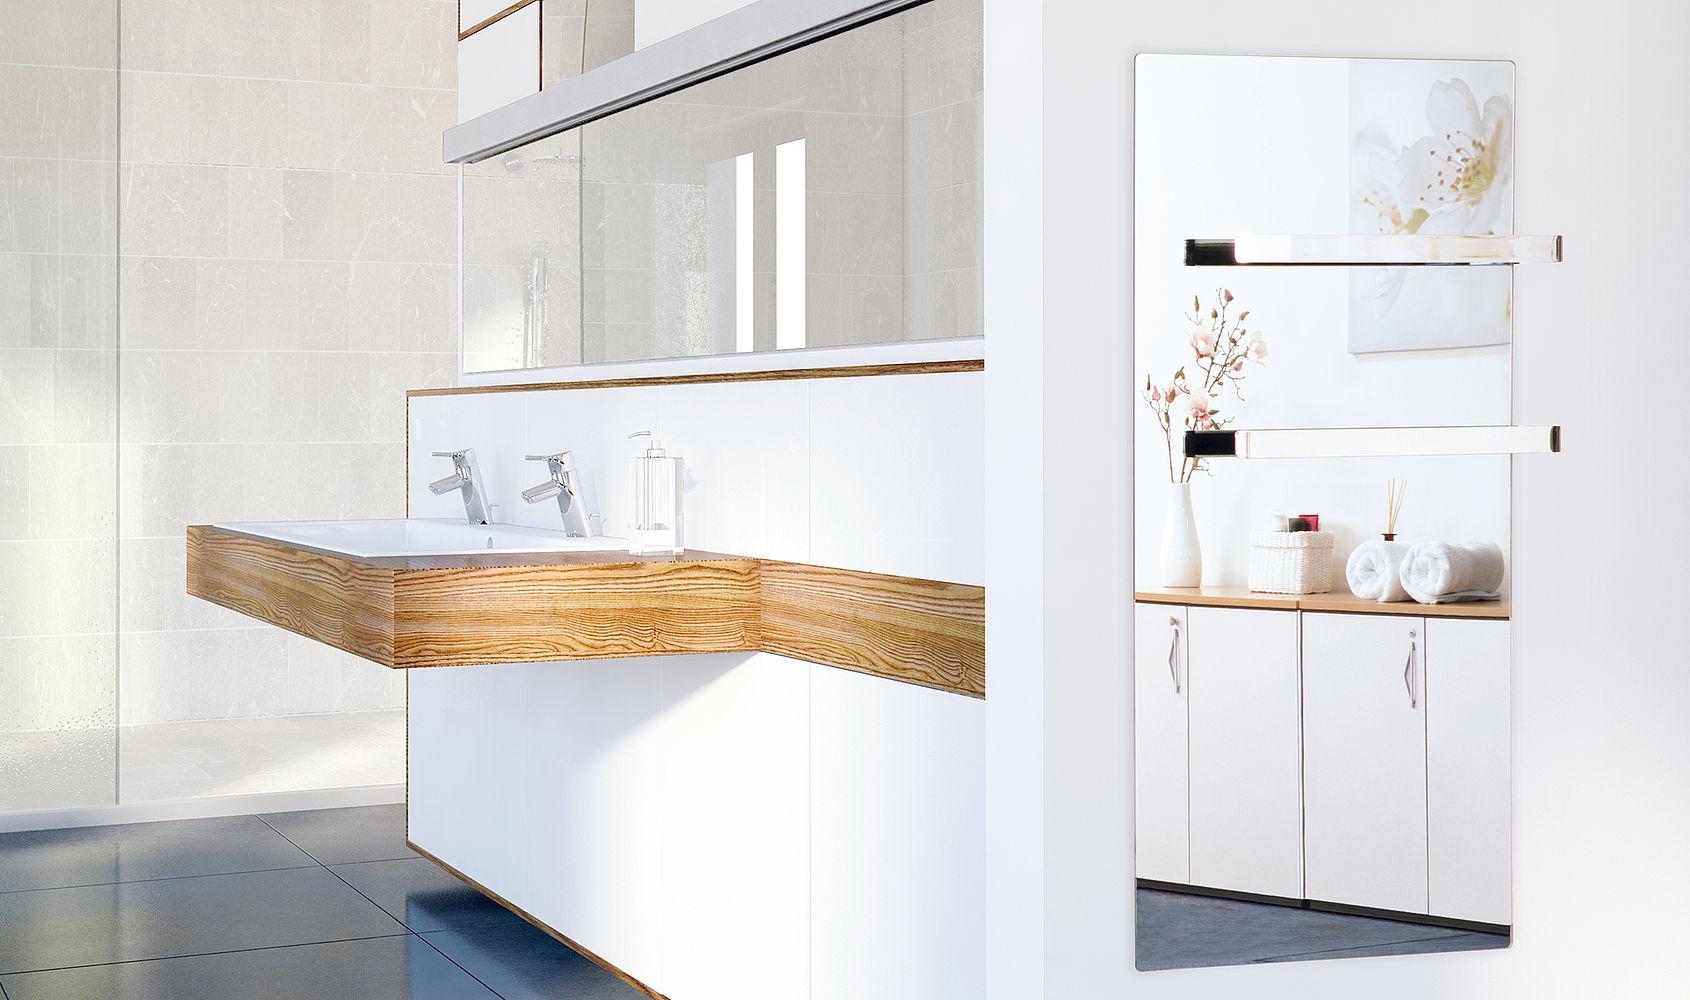 Full Size of Lava Bath 20 Systec Therm Ag Bad Heizkörper Wohnzimmer Für Badezimmer Handtuchhalter Küche Elektroheizkörper Wohnzimmer Handtuchhalter Heizkörper